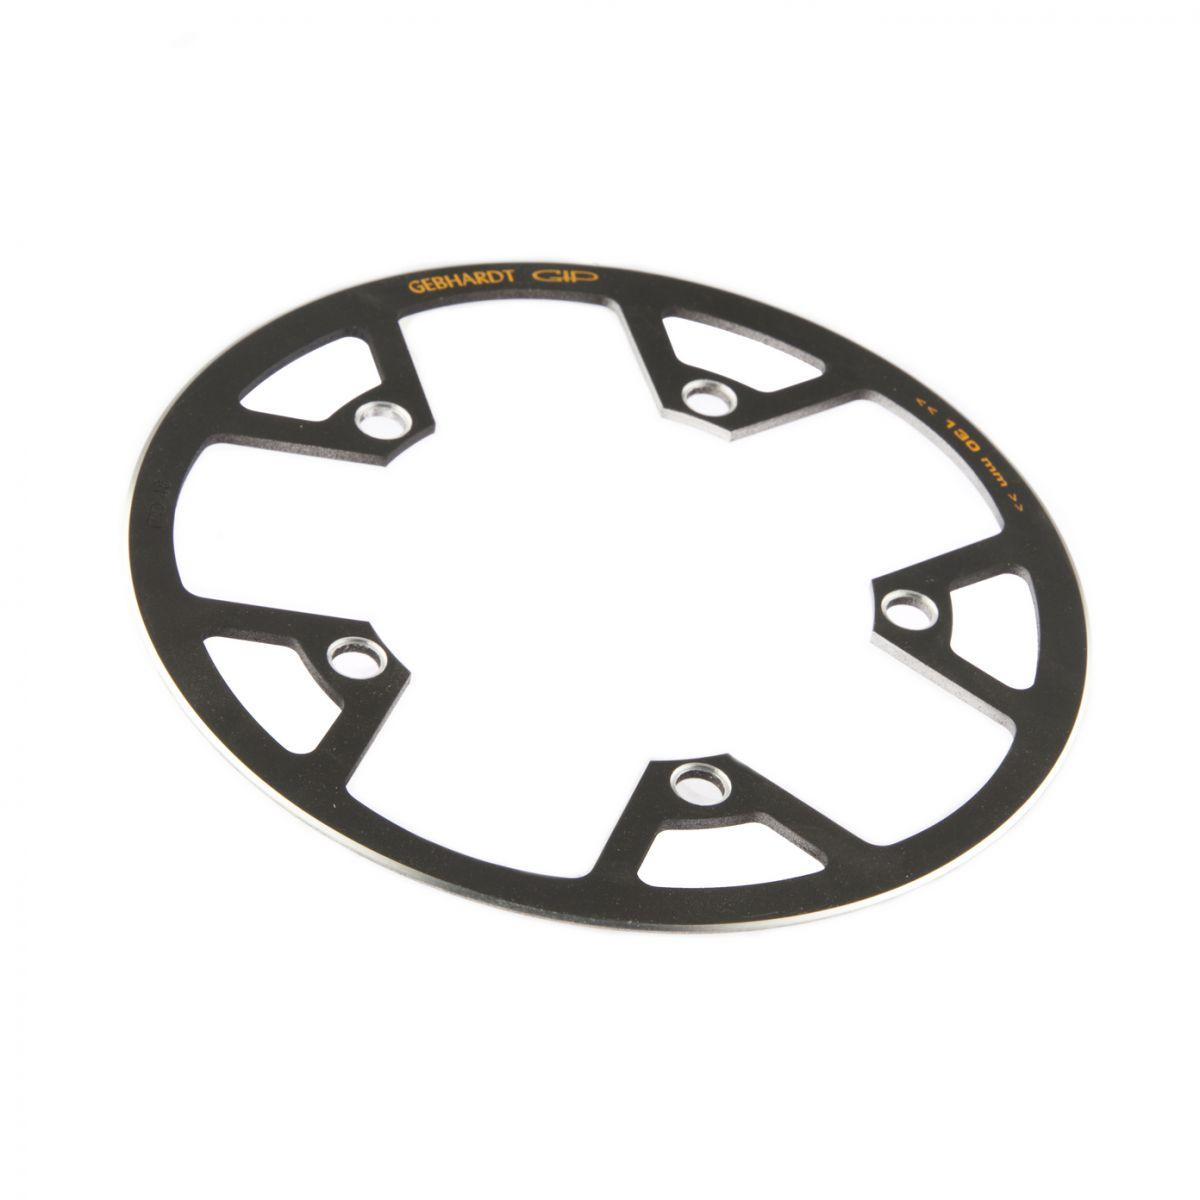 gebhardt kettingbladring rock ring classic bcd 130mm 5gats 48t zwart